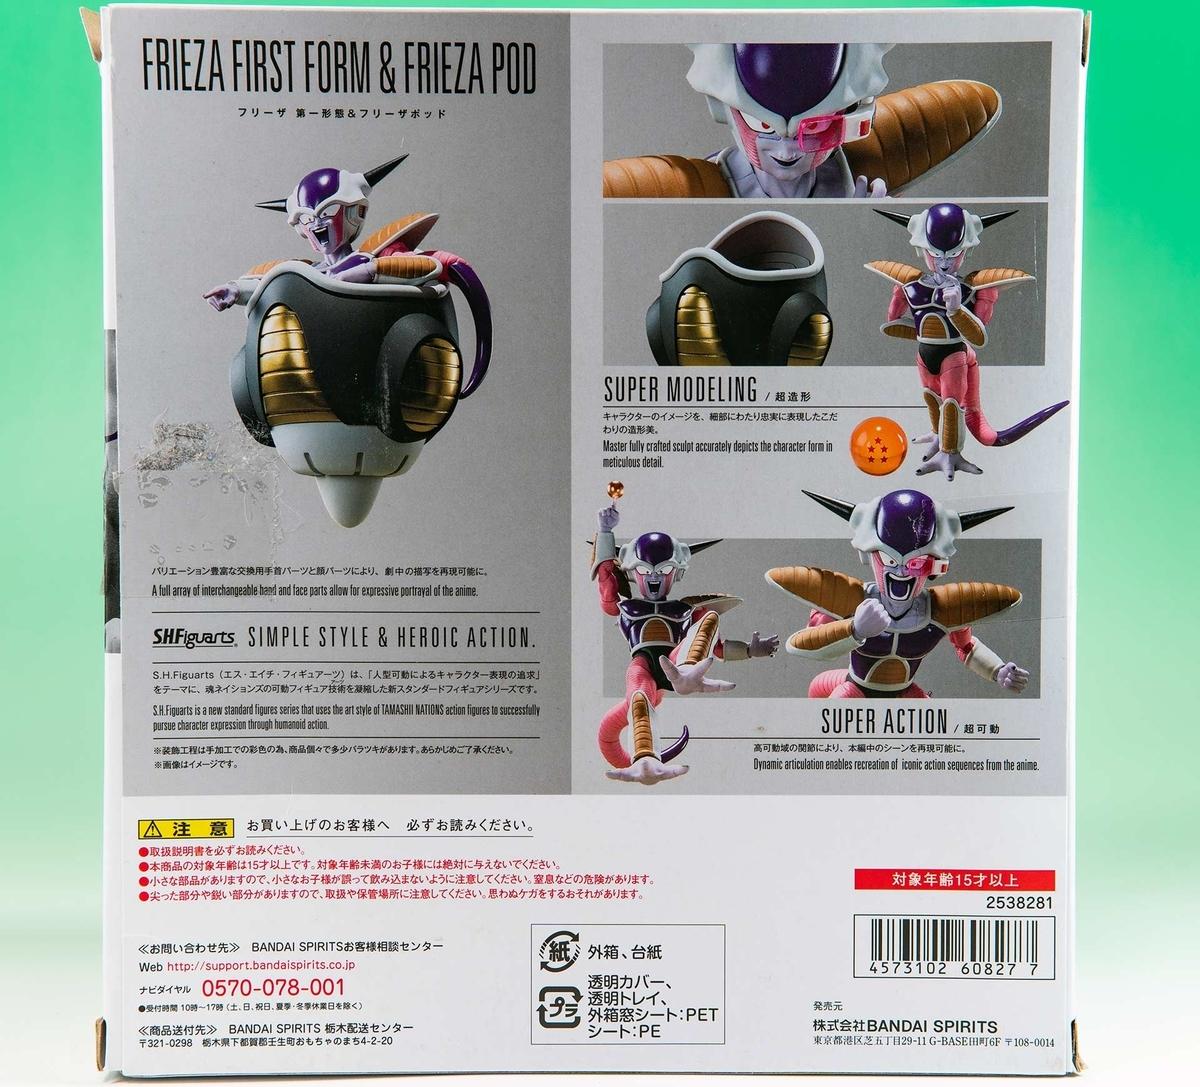 f:id:hiroban-ch:20210829151045j:plain